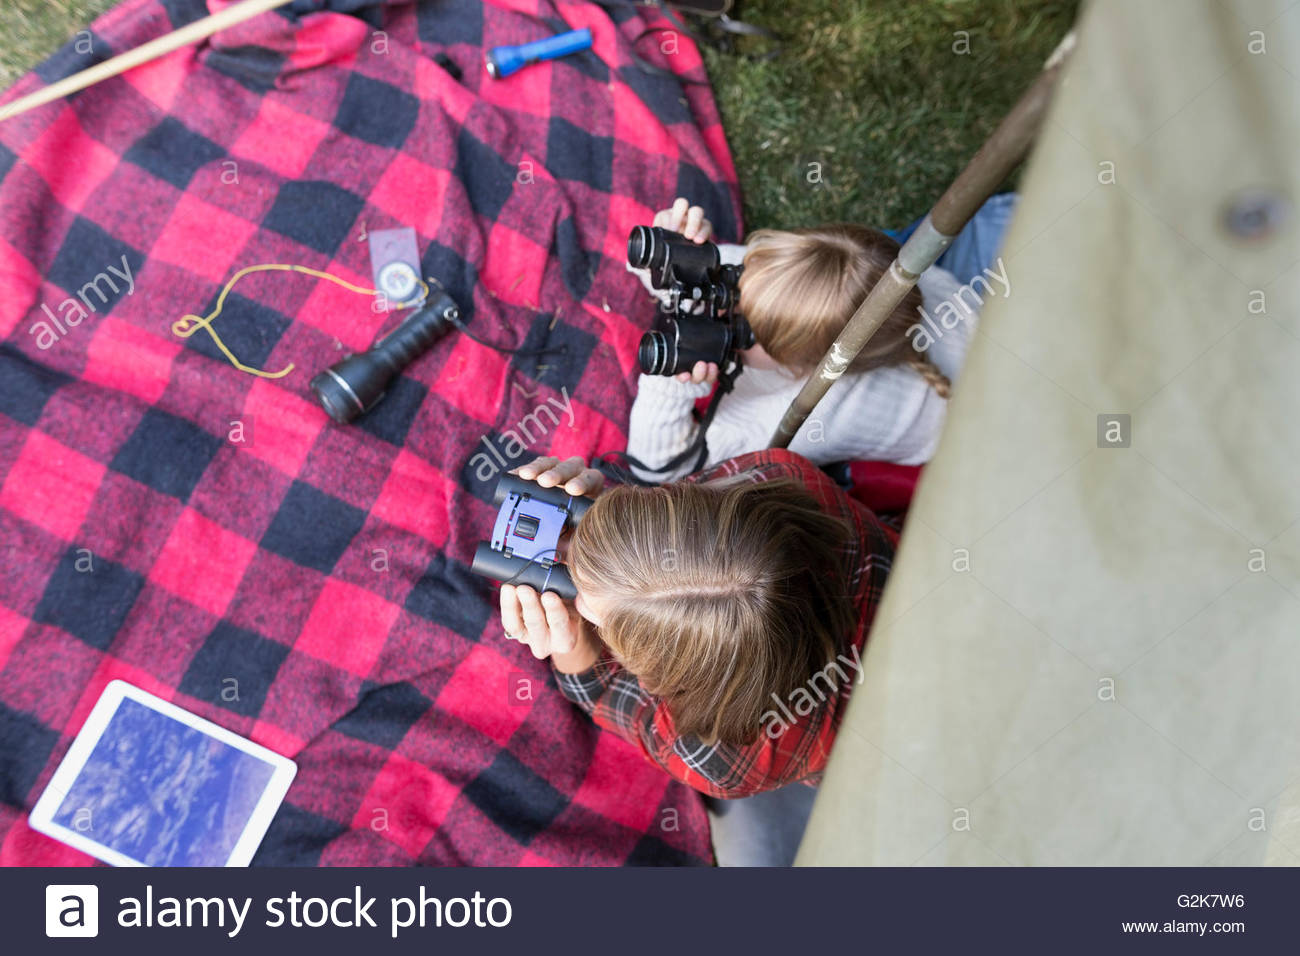 Overhead view sisters using binoculars in tent - Stock Image